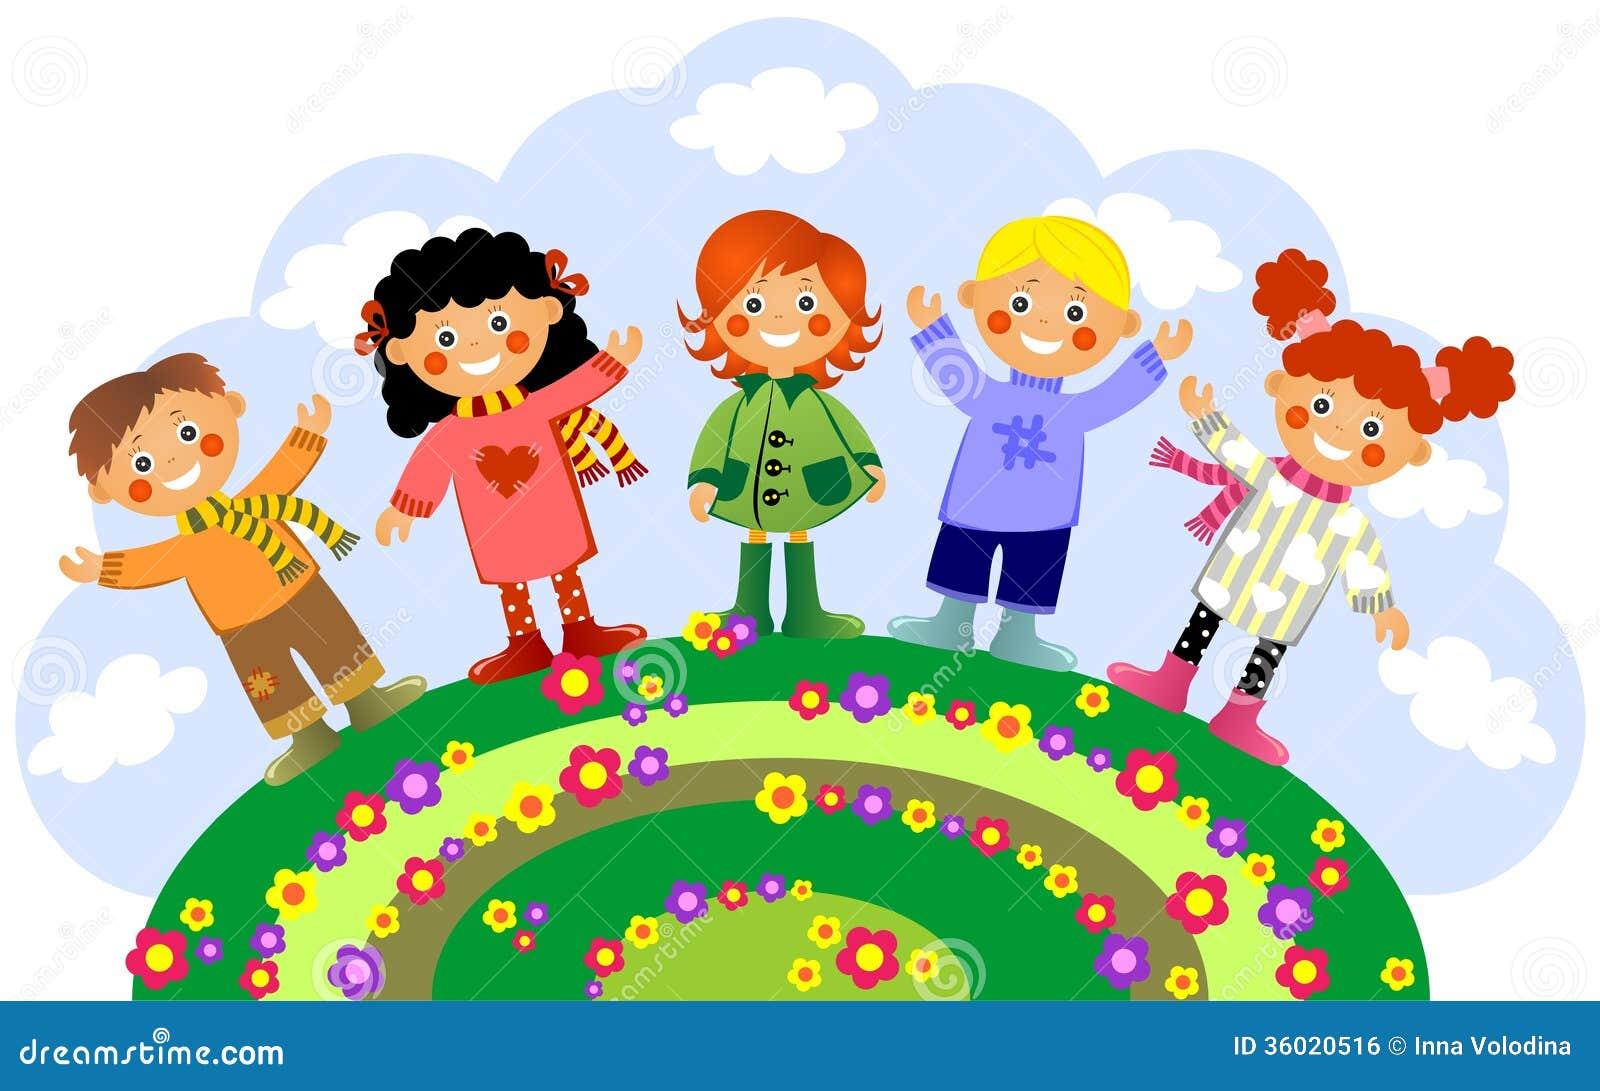 children glade rejoice spring - Spring Pictures For Children